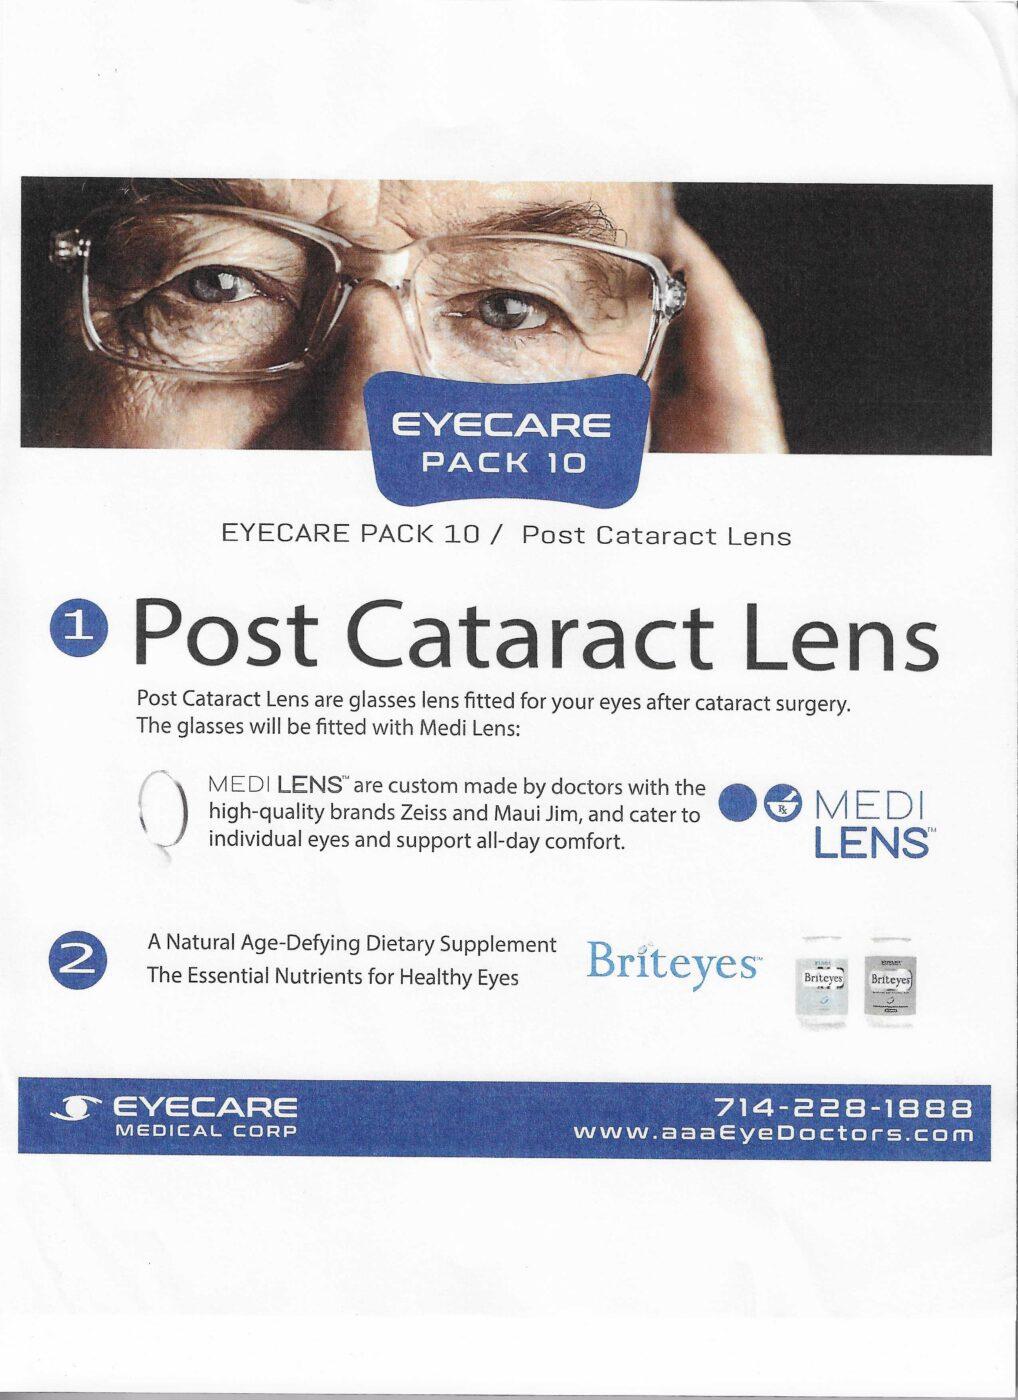 Post Cataract Lens